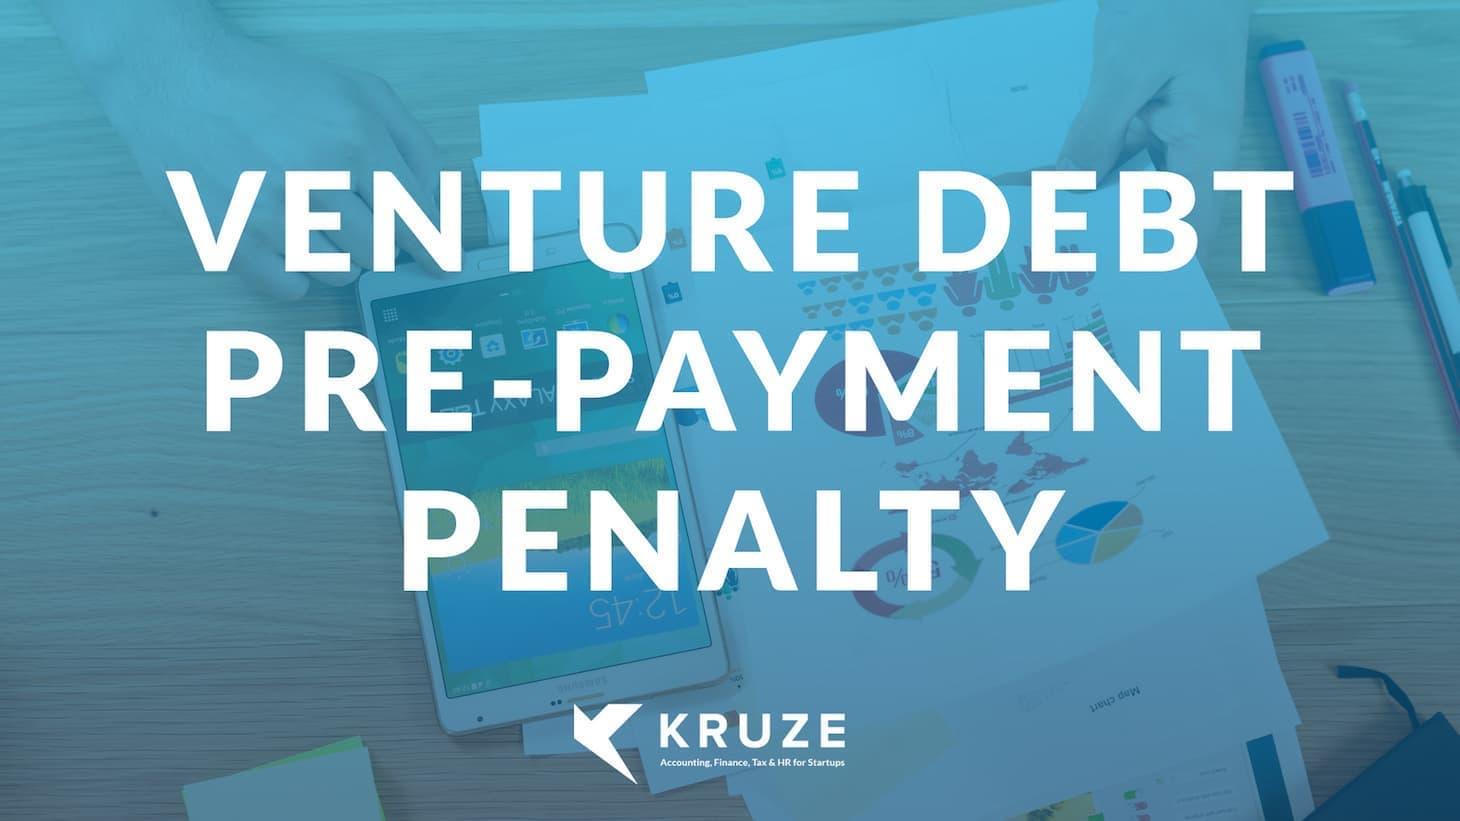 Venture Debt Pre-Payment Penalty